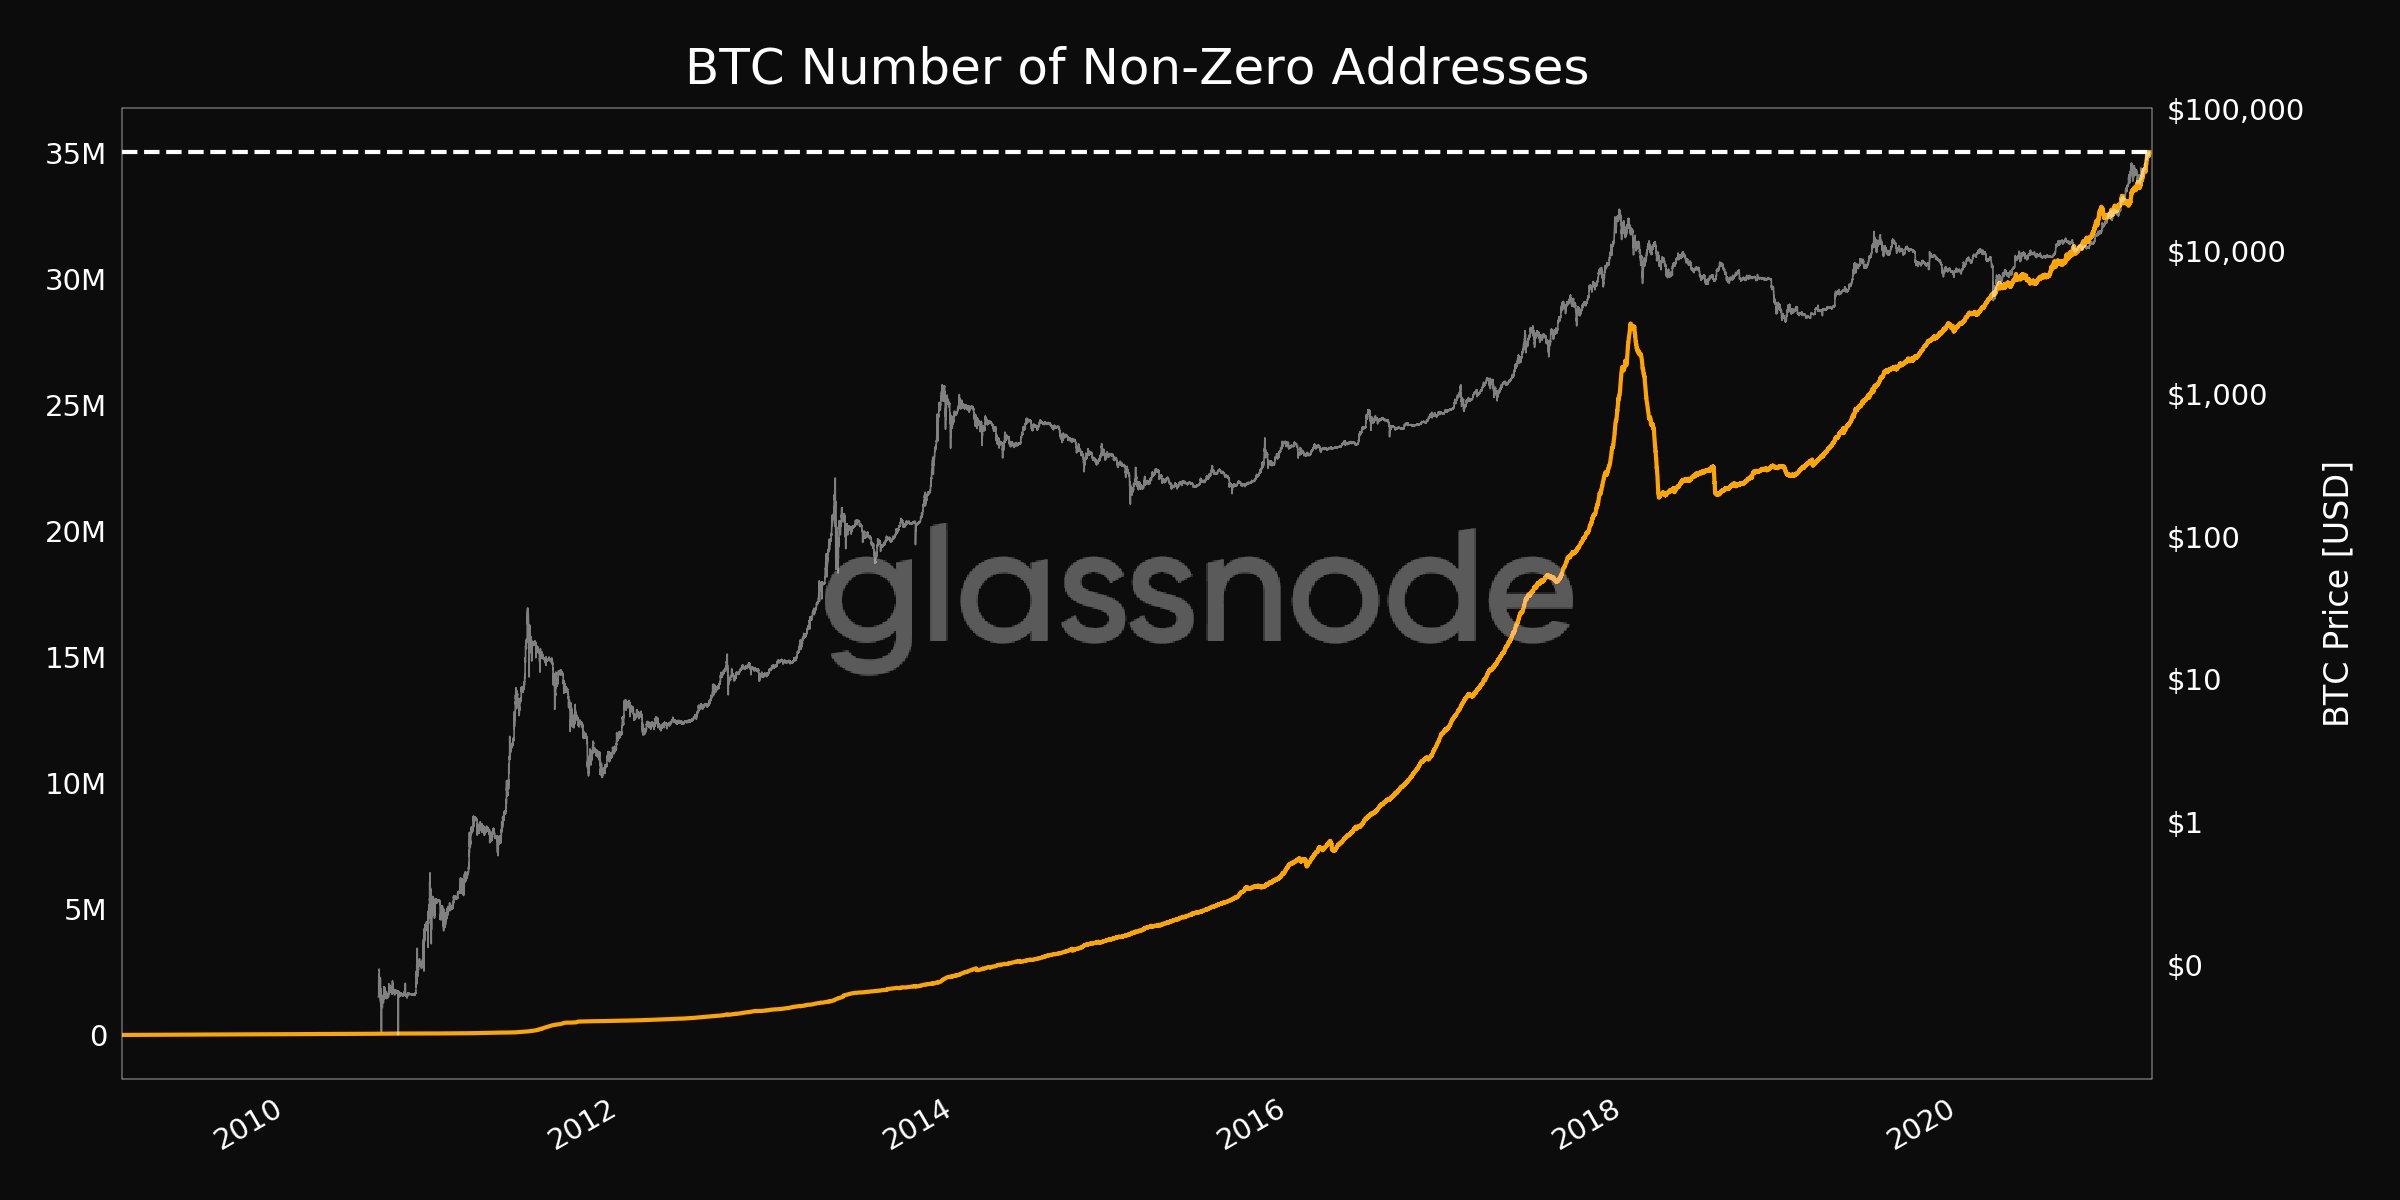 glassnode-bitcoin-btc-kripto-para